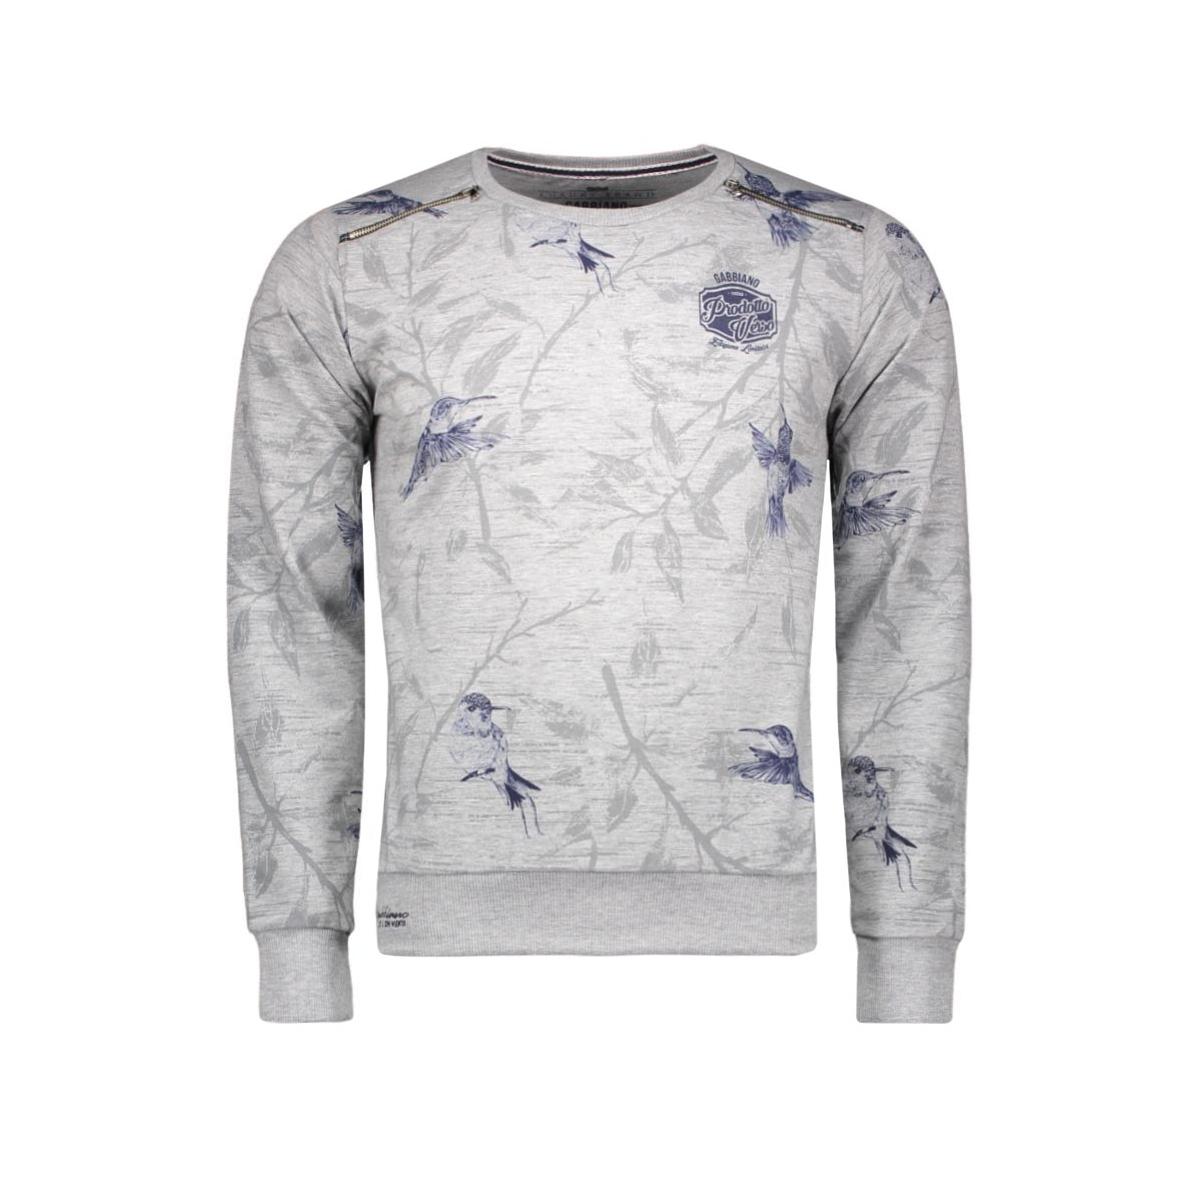 5378 gabbiano sweater grijs